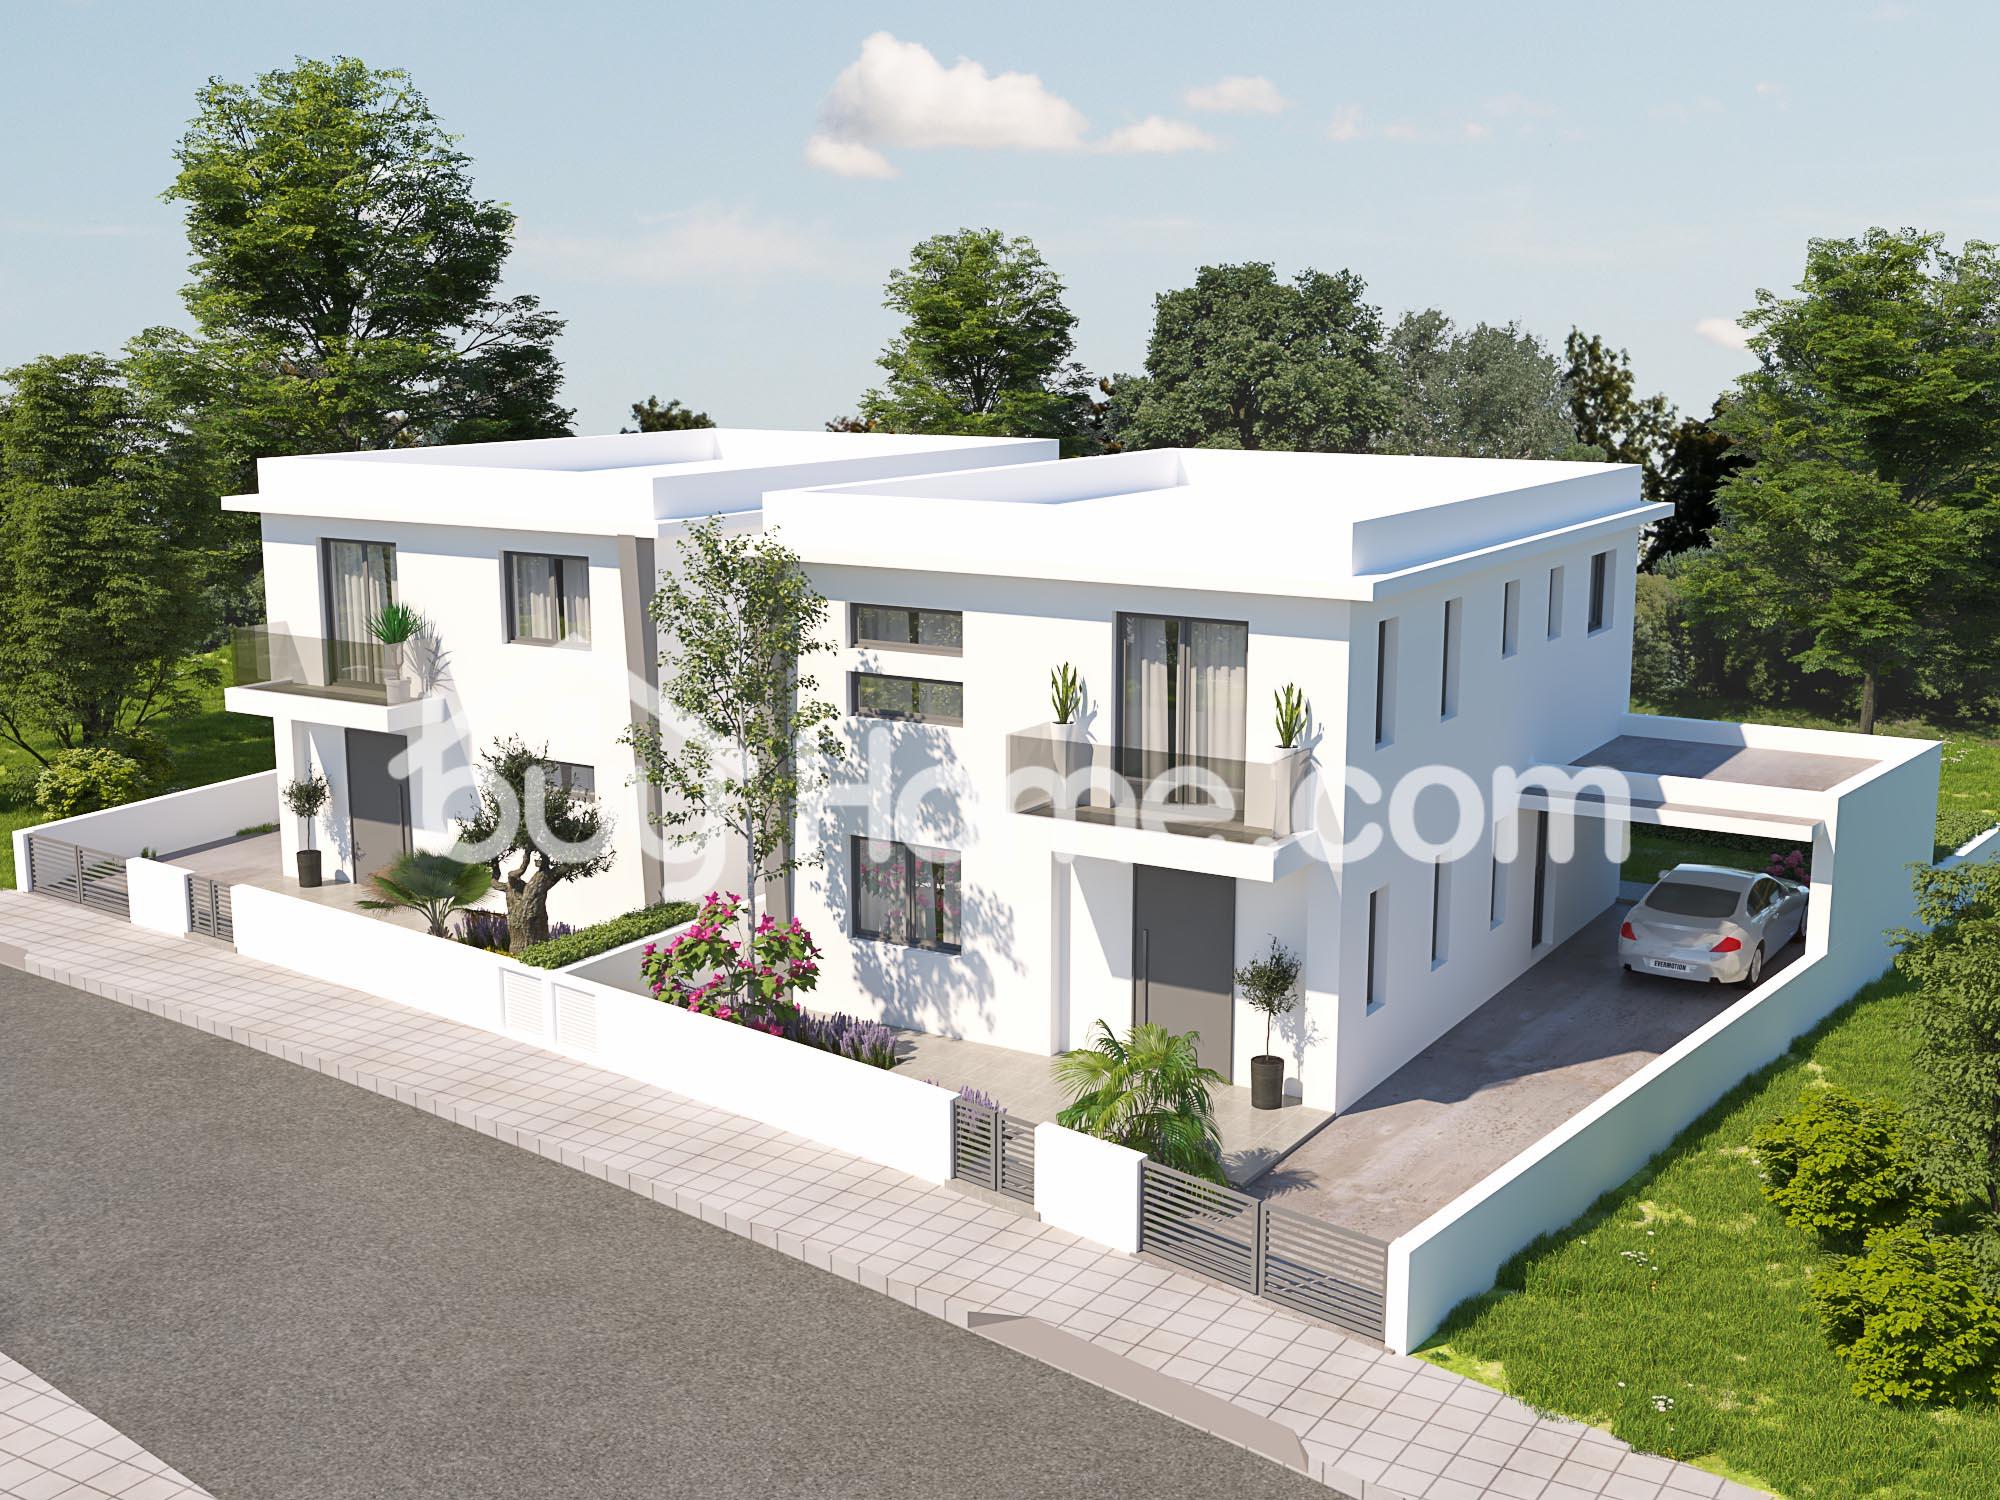 4 Bedroom Link Detached House | BuyHome